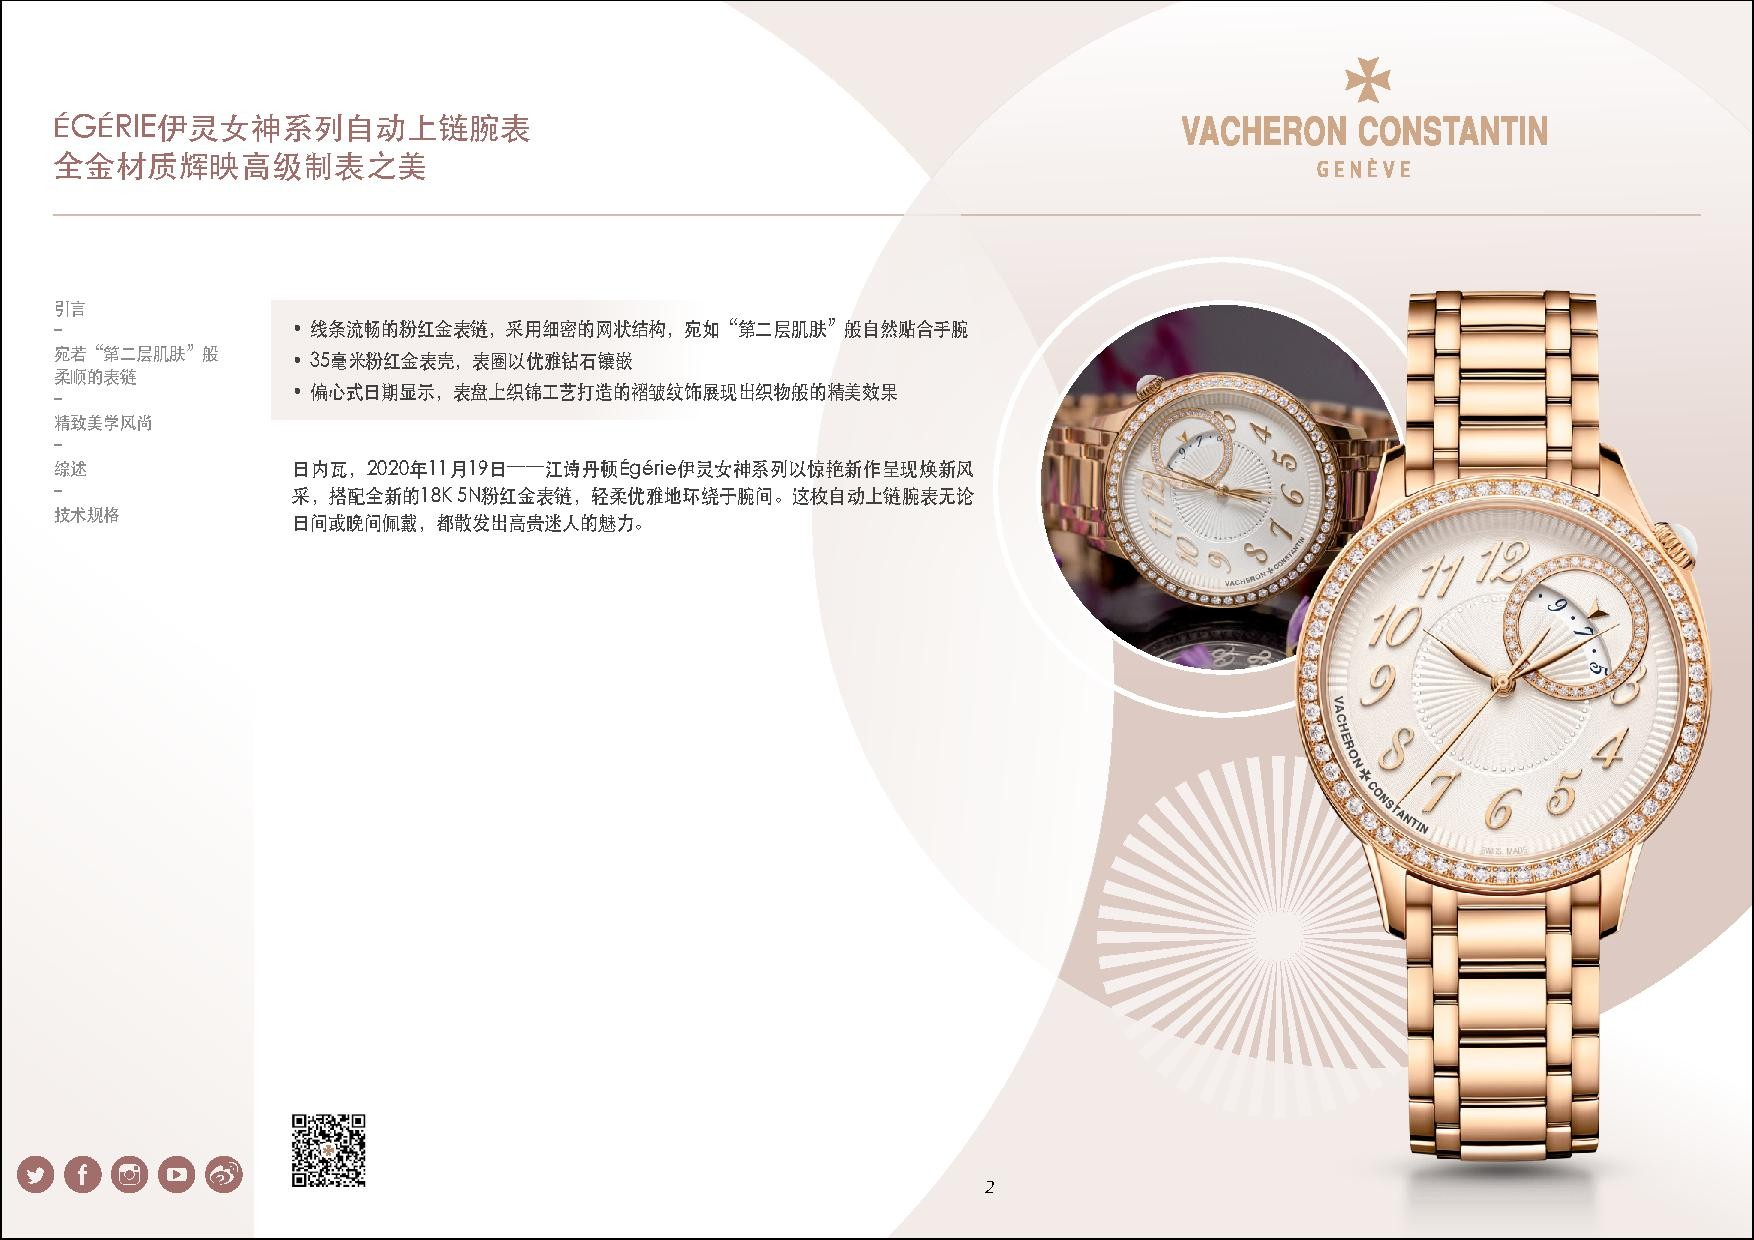 Égérie伊灵女神系列自动上精仿手表链腕表 全金材质辉映高级制表之美